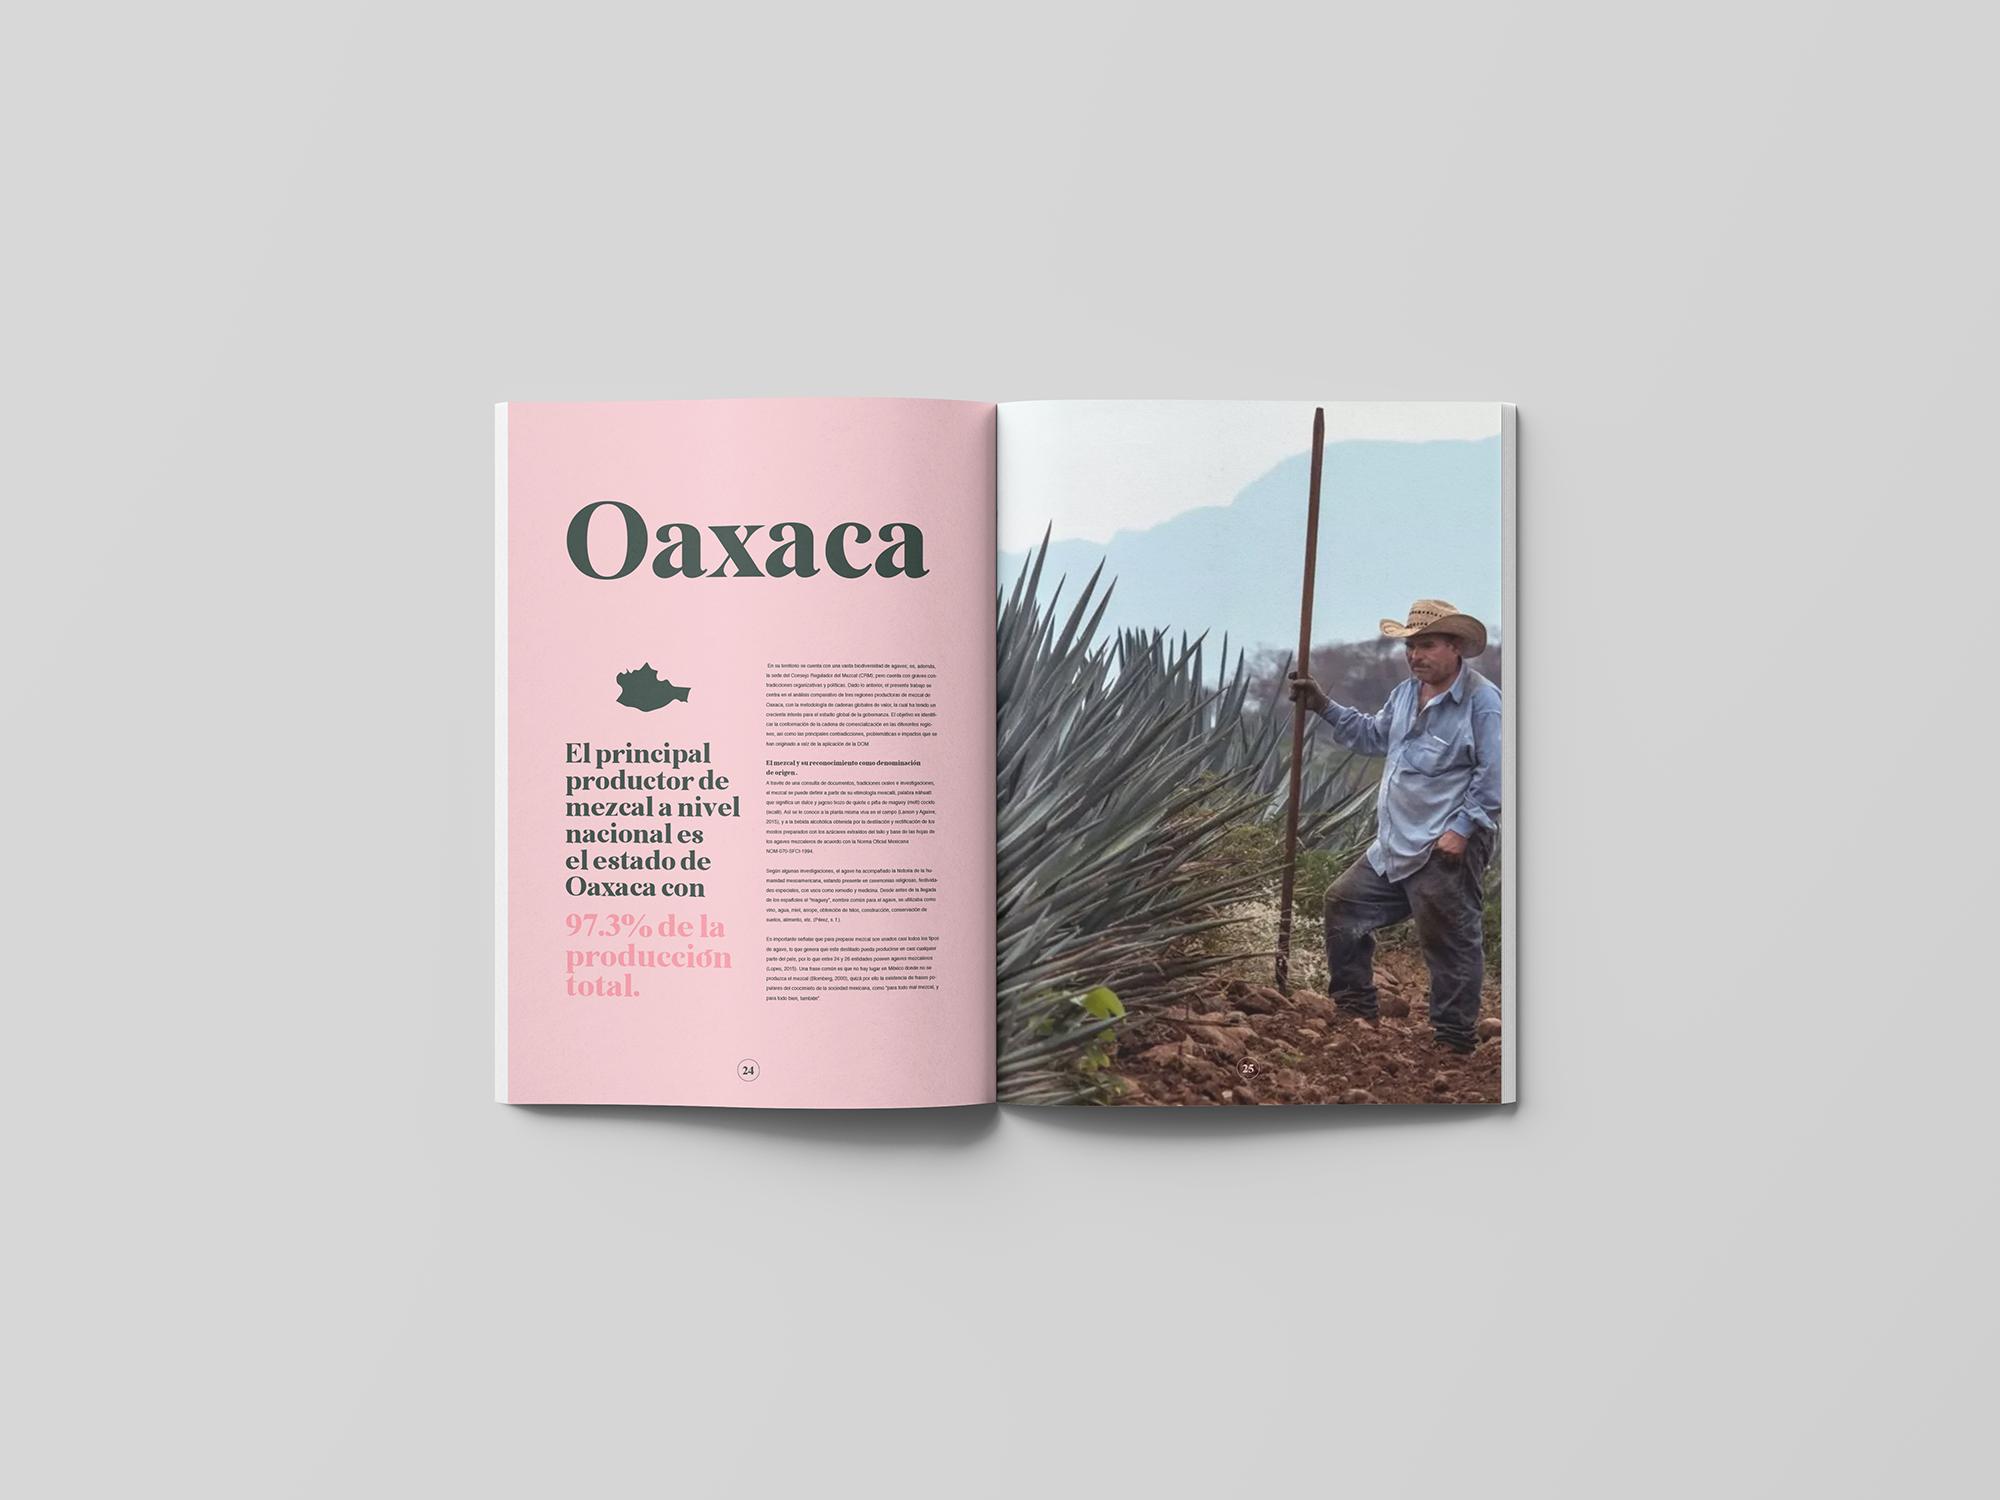 spread-12-book-agave-yoenpaperland